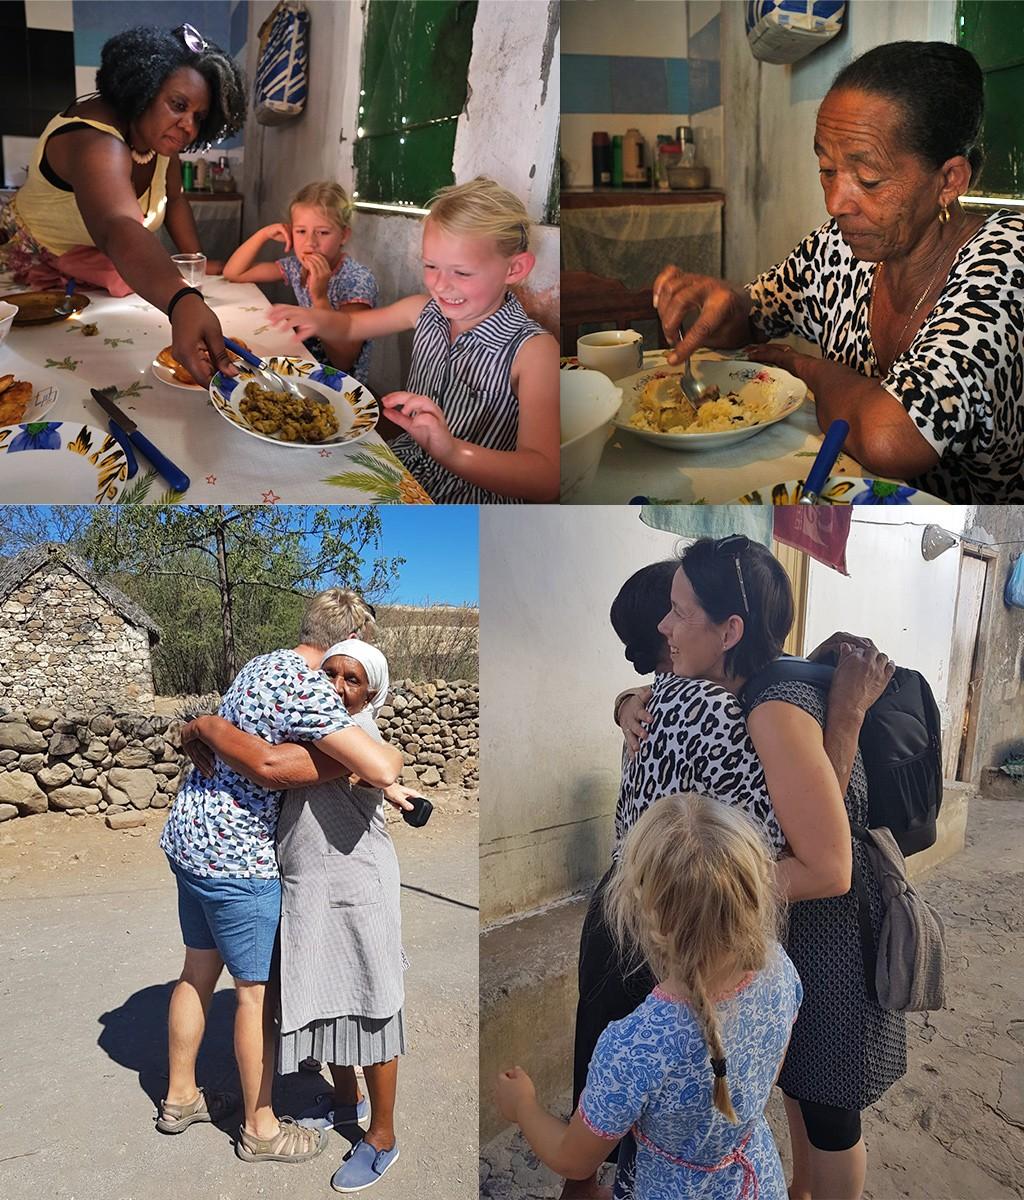 mensen verbinden door samen te eten Kaapverdië